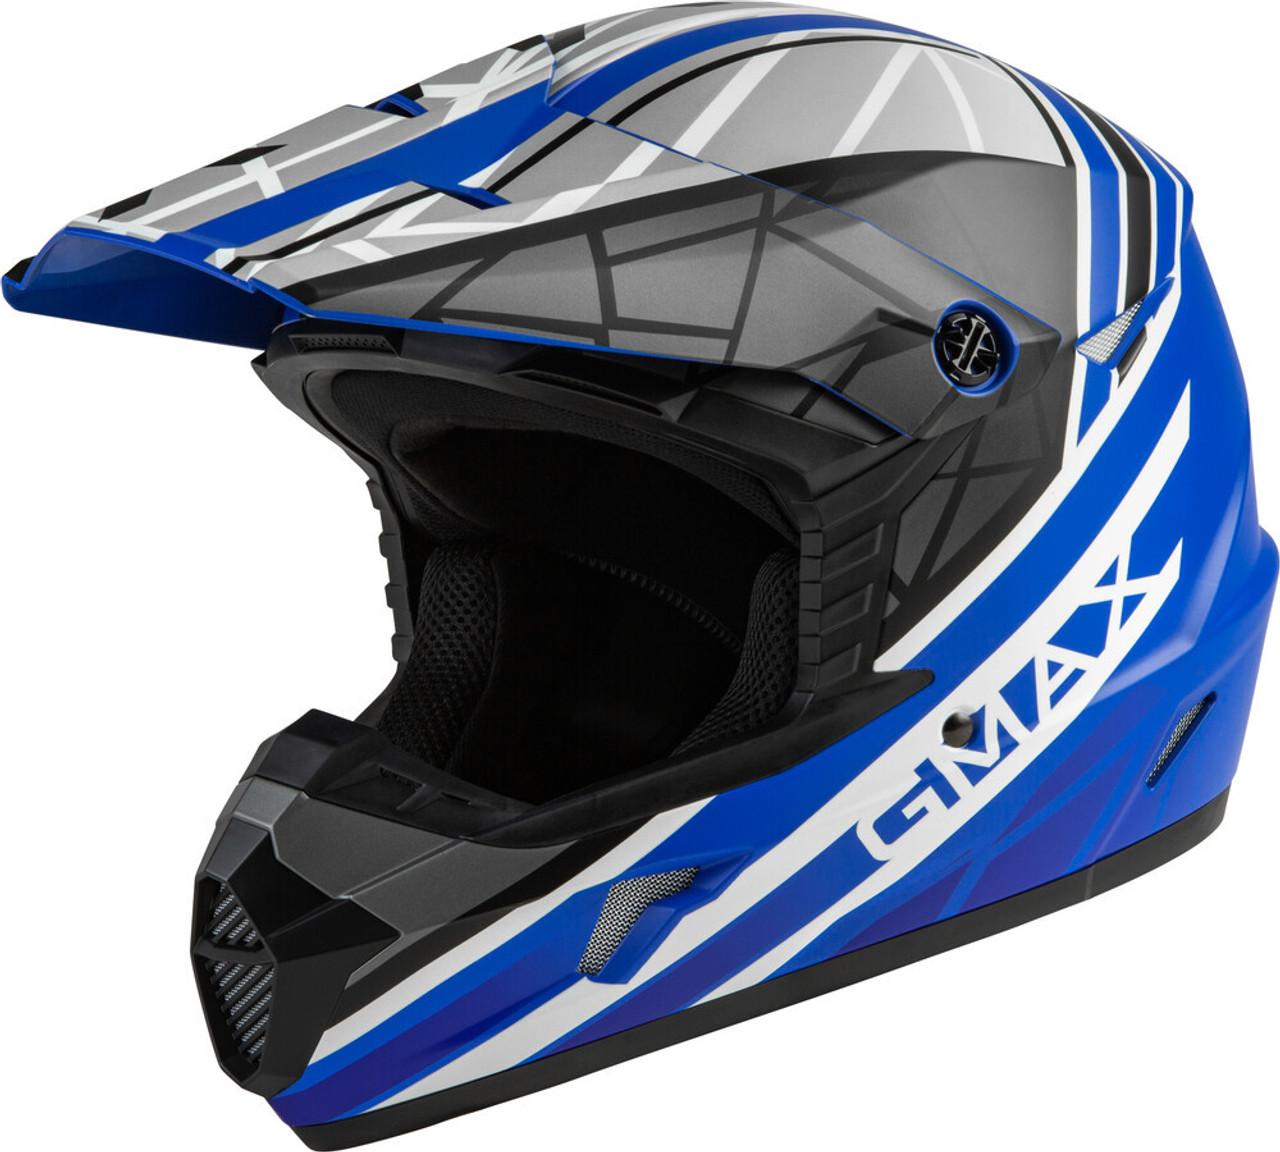 GMAX MX-46 Mega Off-Road Helmet Matte Blue/Black/White